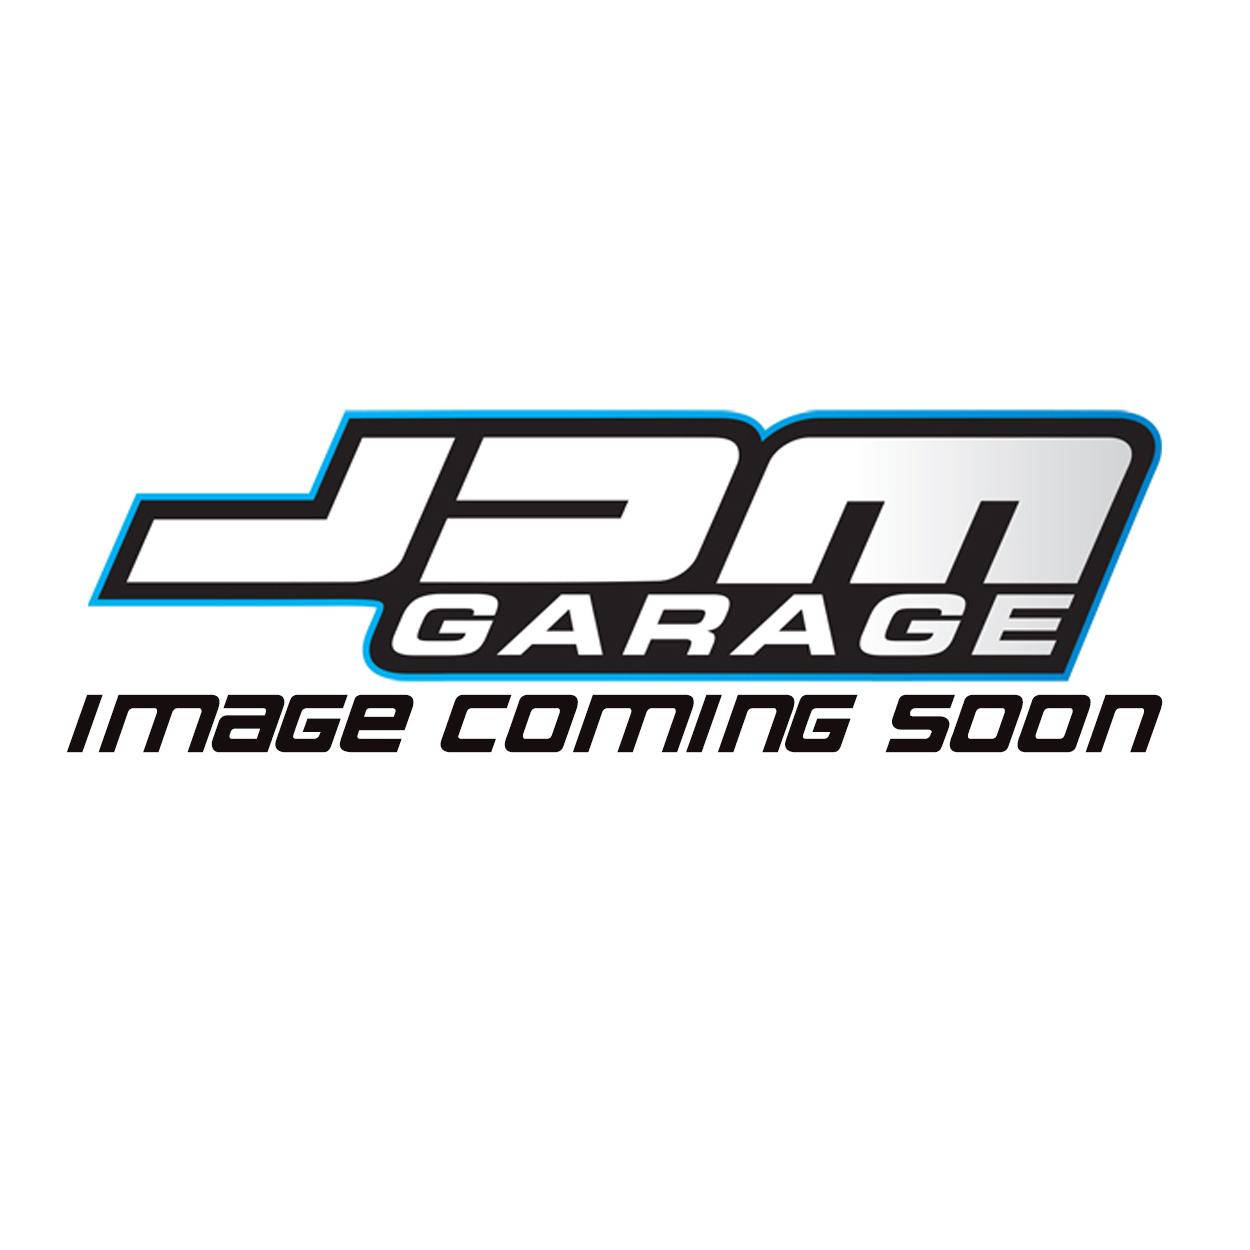 Front Emblem Badge Fits Toyota Supra MK4 JZA80 75314-14010